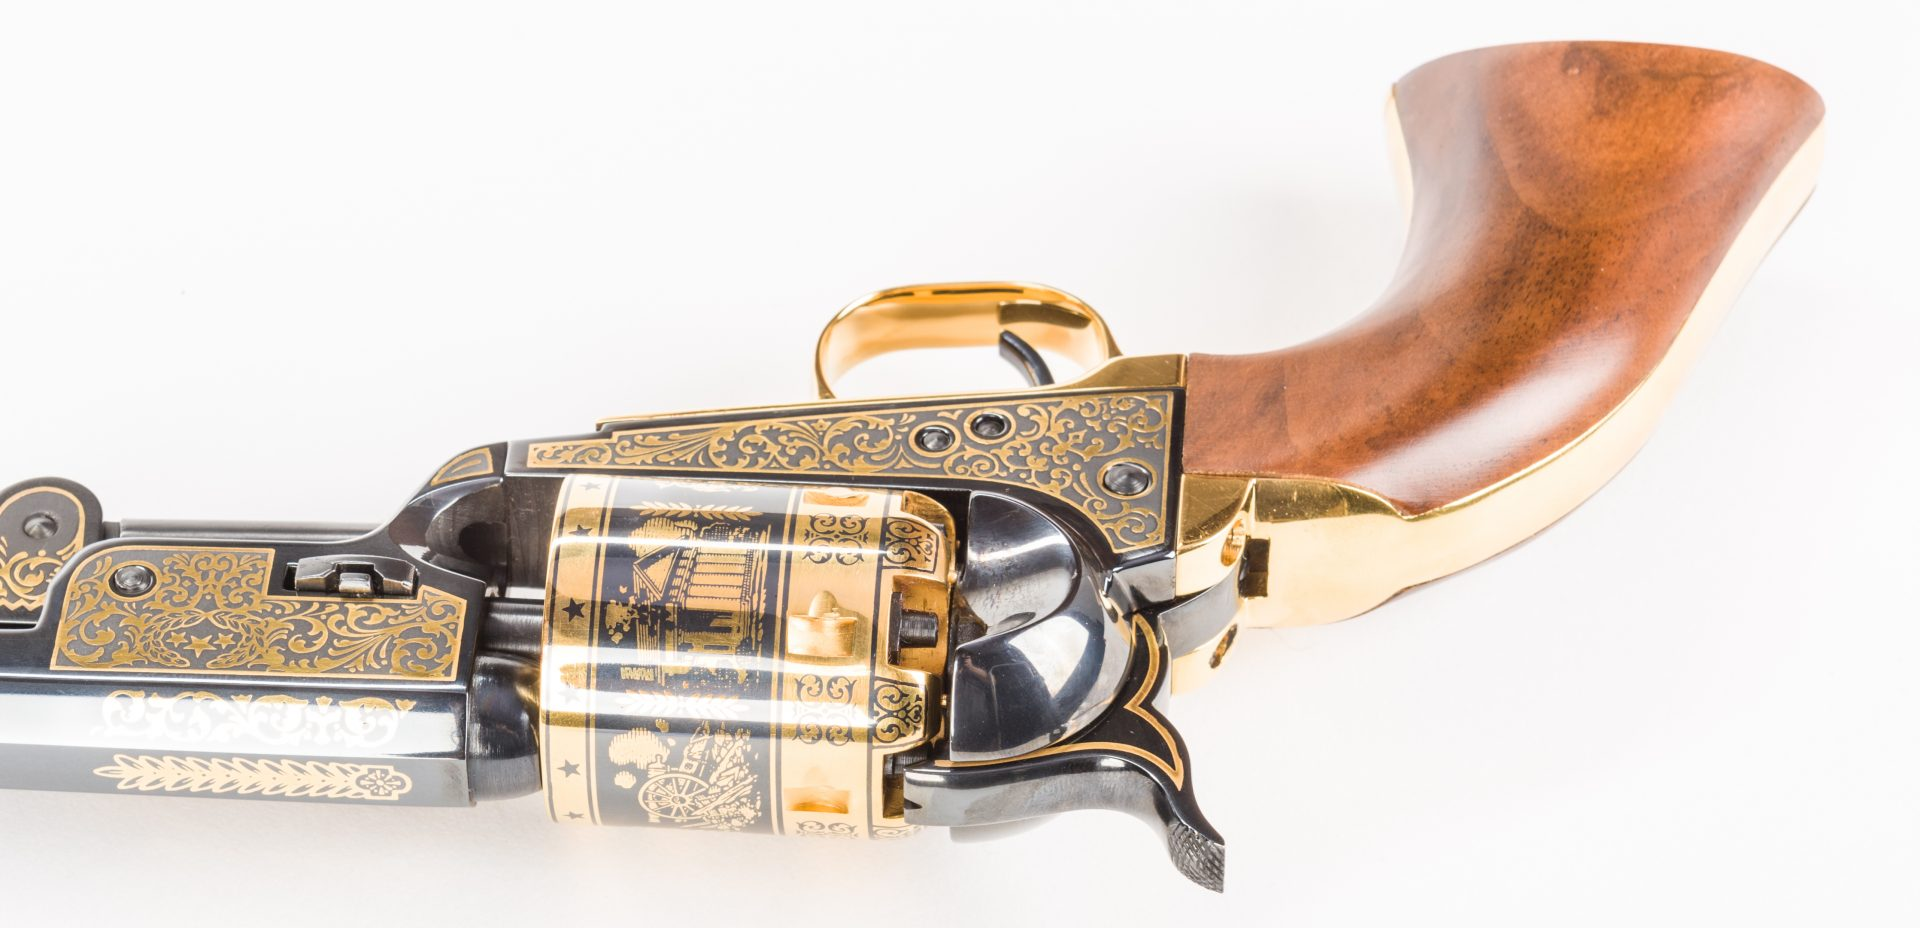 Lot 223: Robert E. Lee Commemorative Pistol, U.S. Historical Society